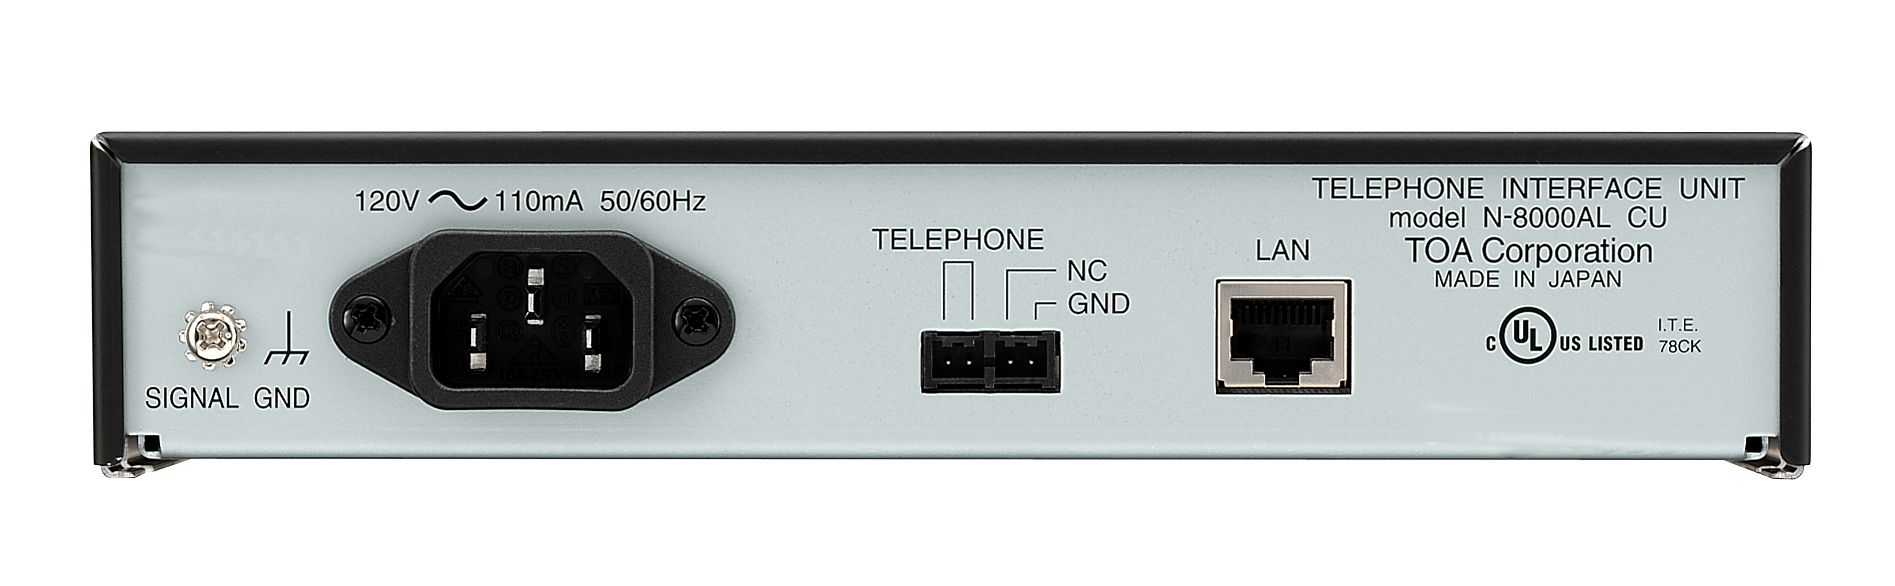 N 8000al Ce Produits Toa Electronics